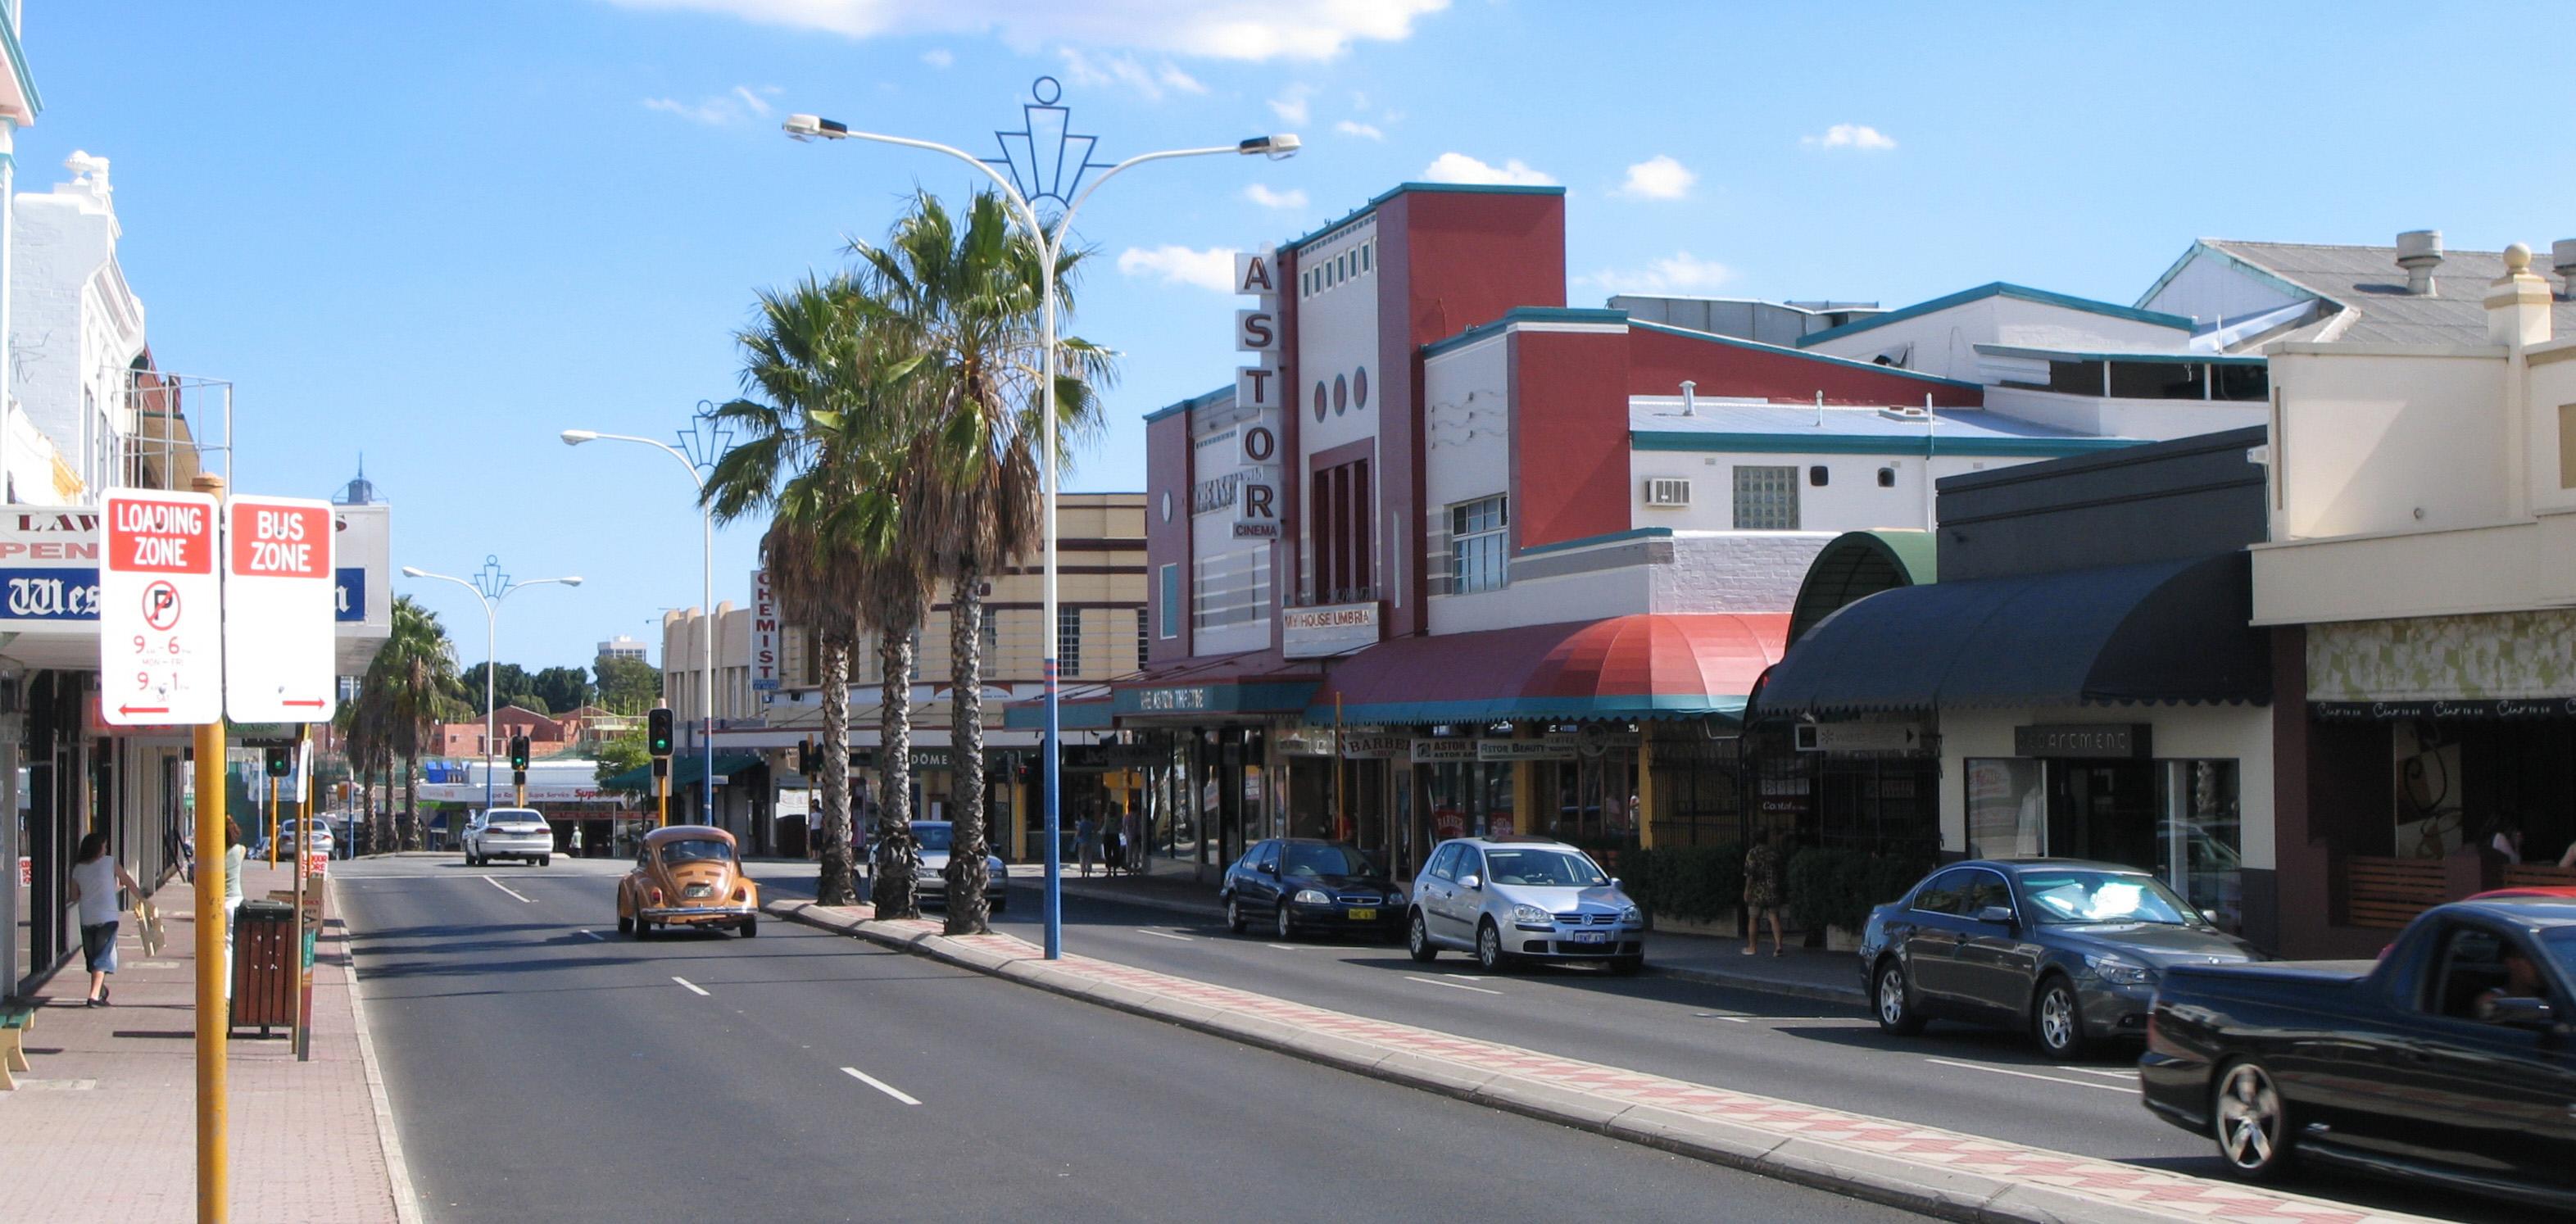 Beaufort Australia  city photos : beaufort, South Australia, Australia What happens in beaufort right ...